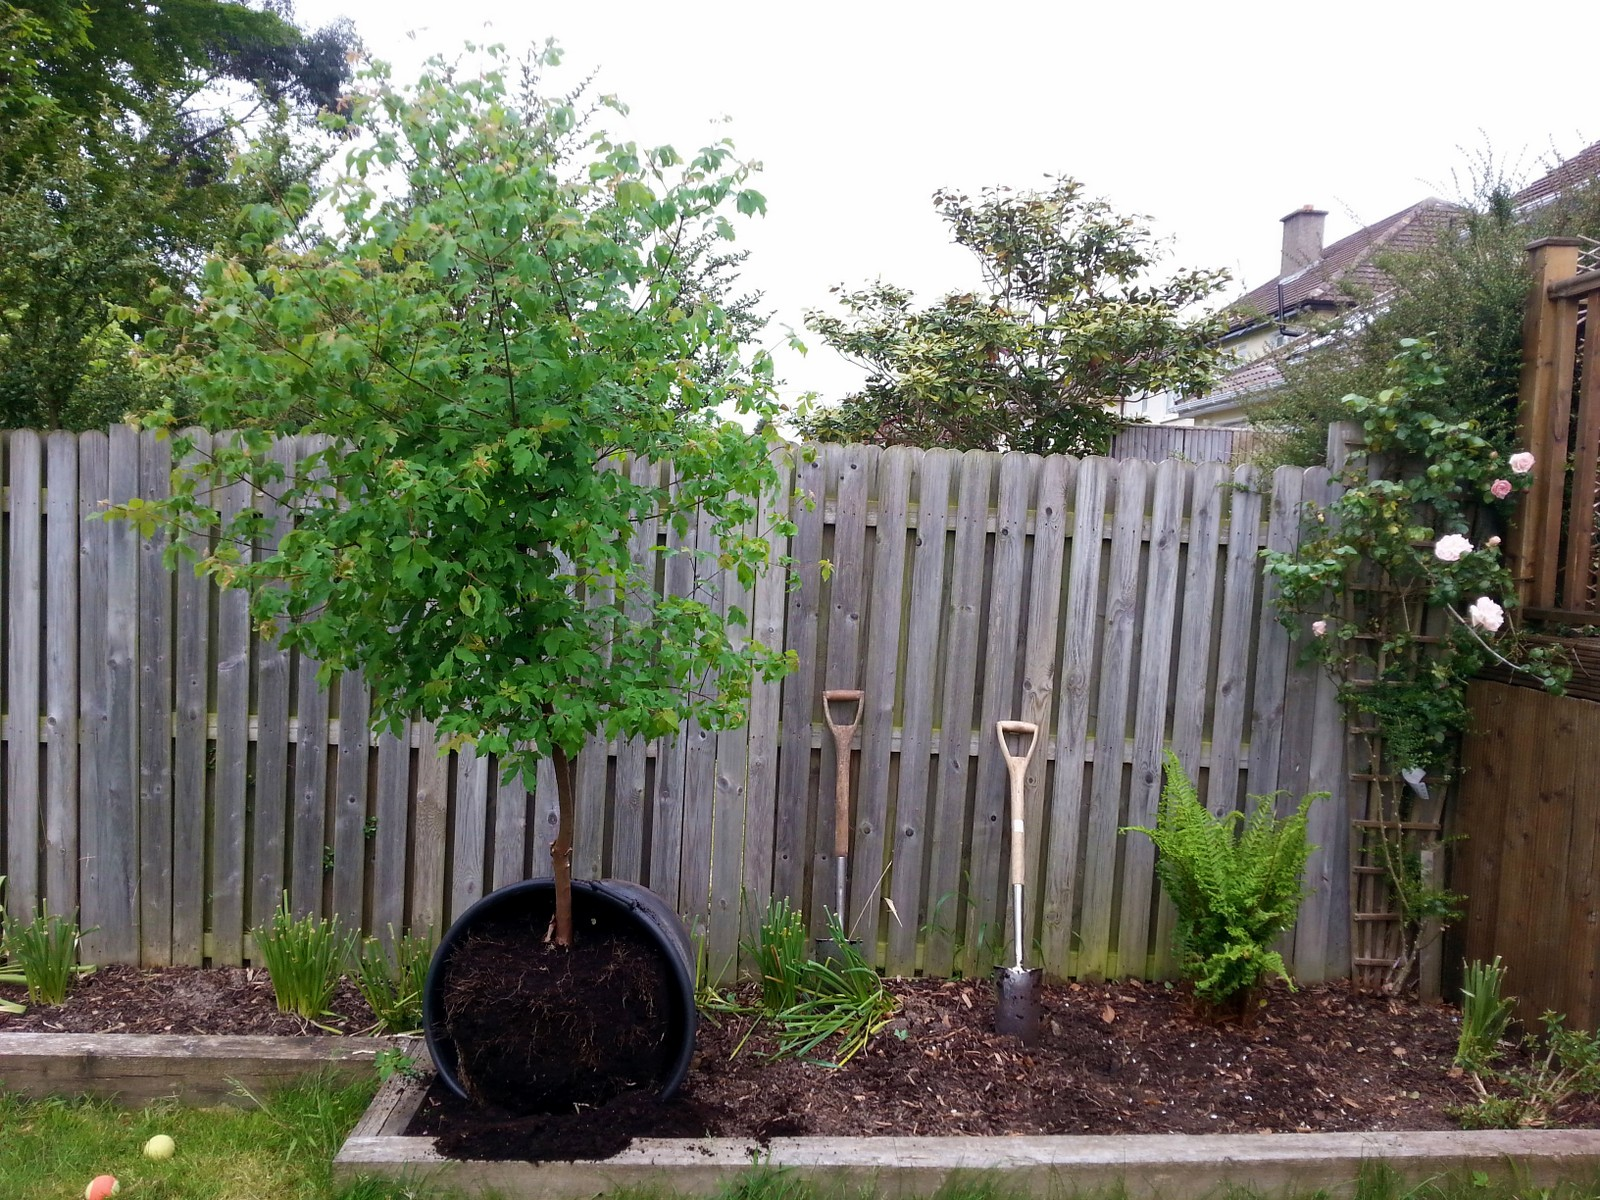 4. Acer griseum